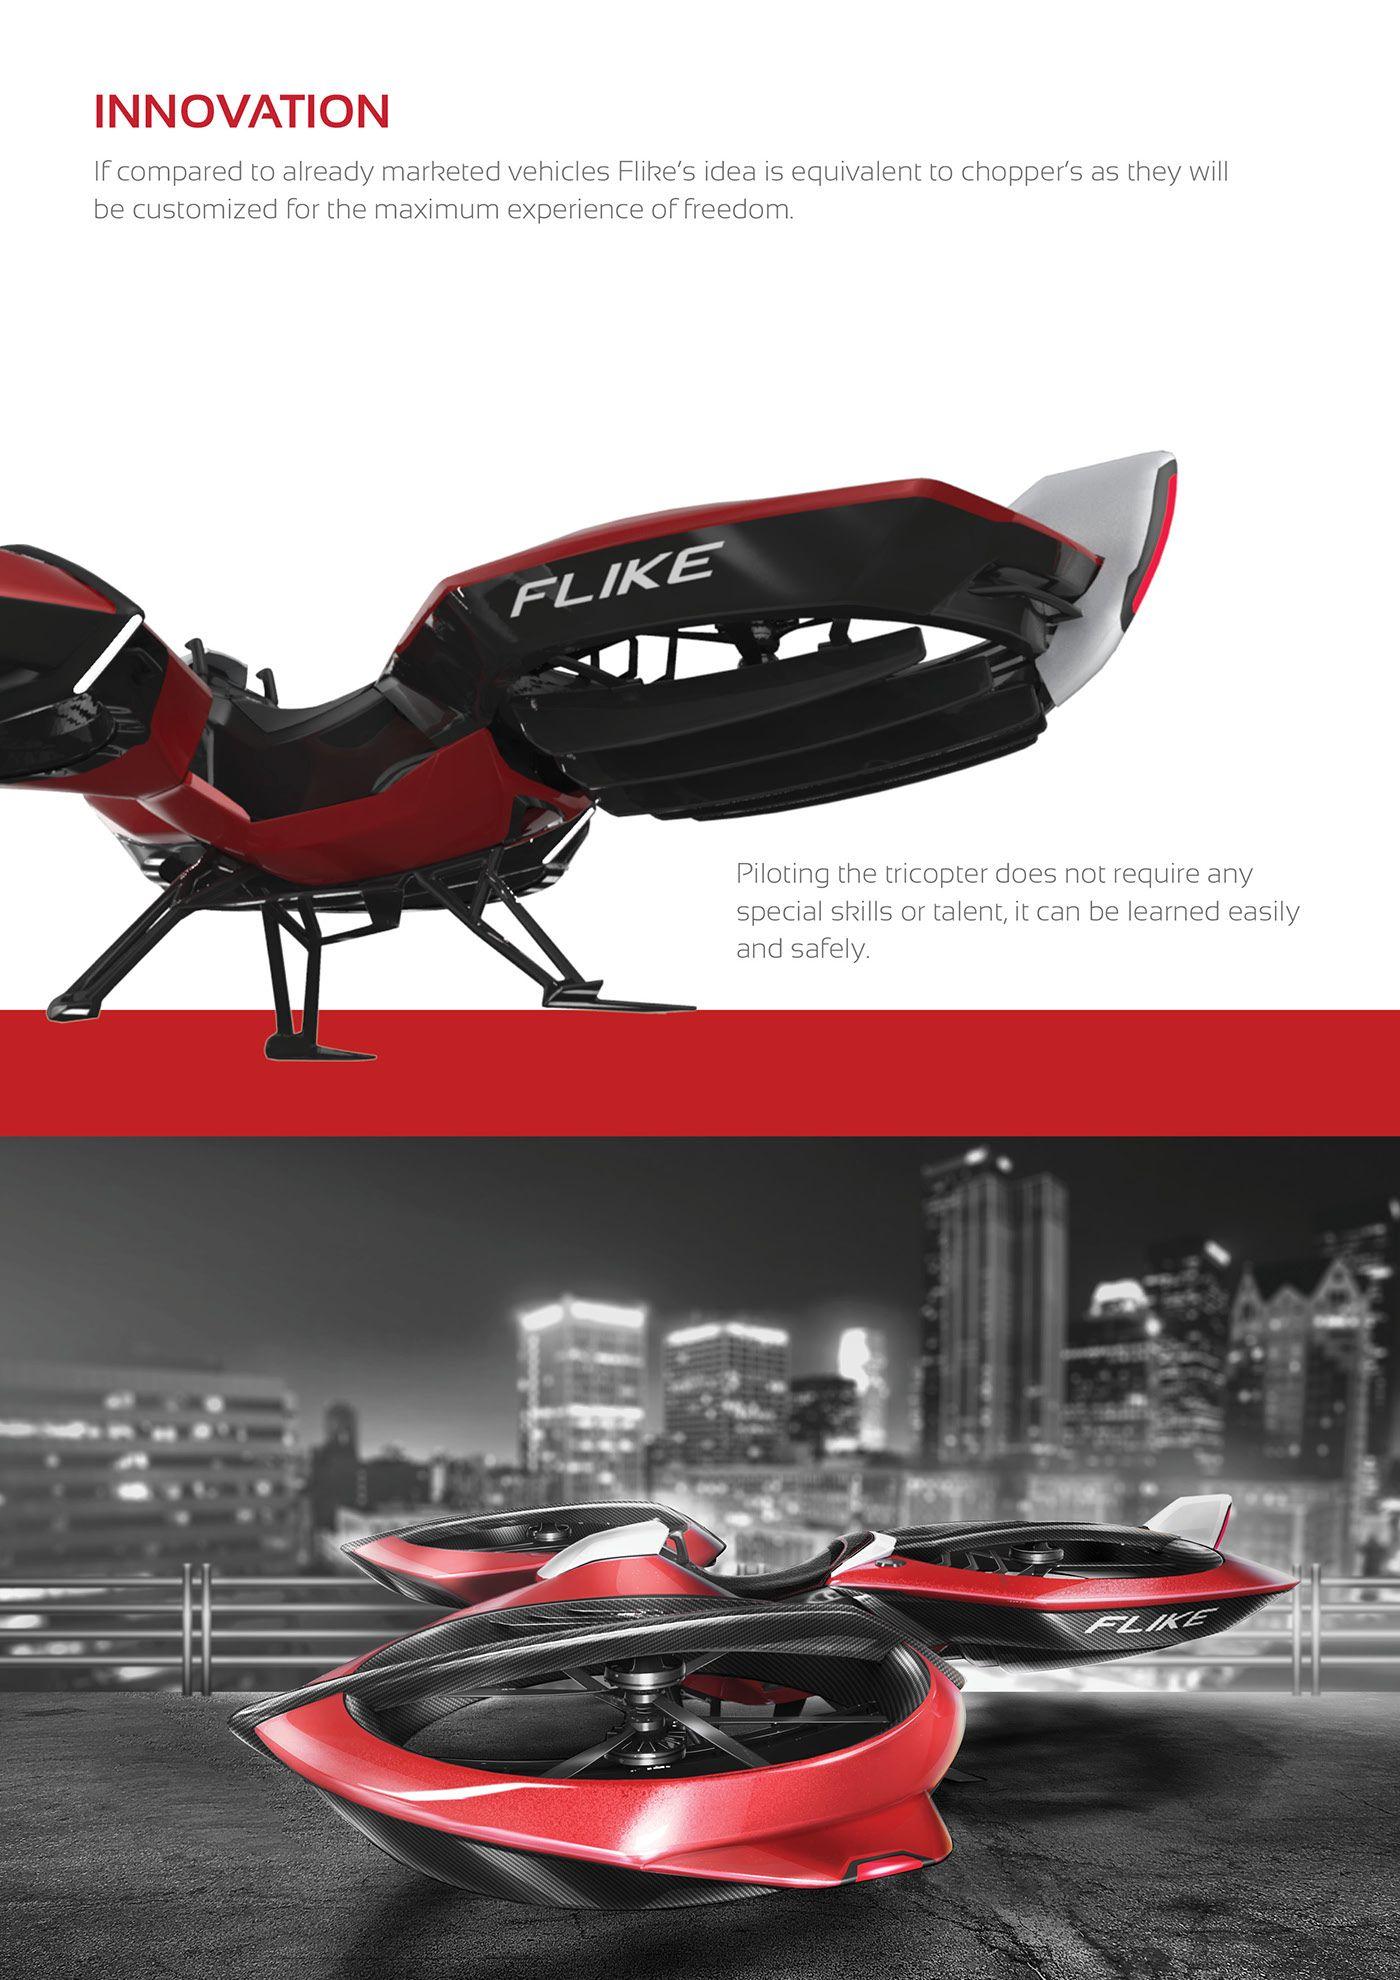 manned drone flight